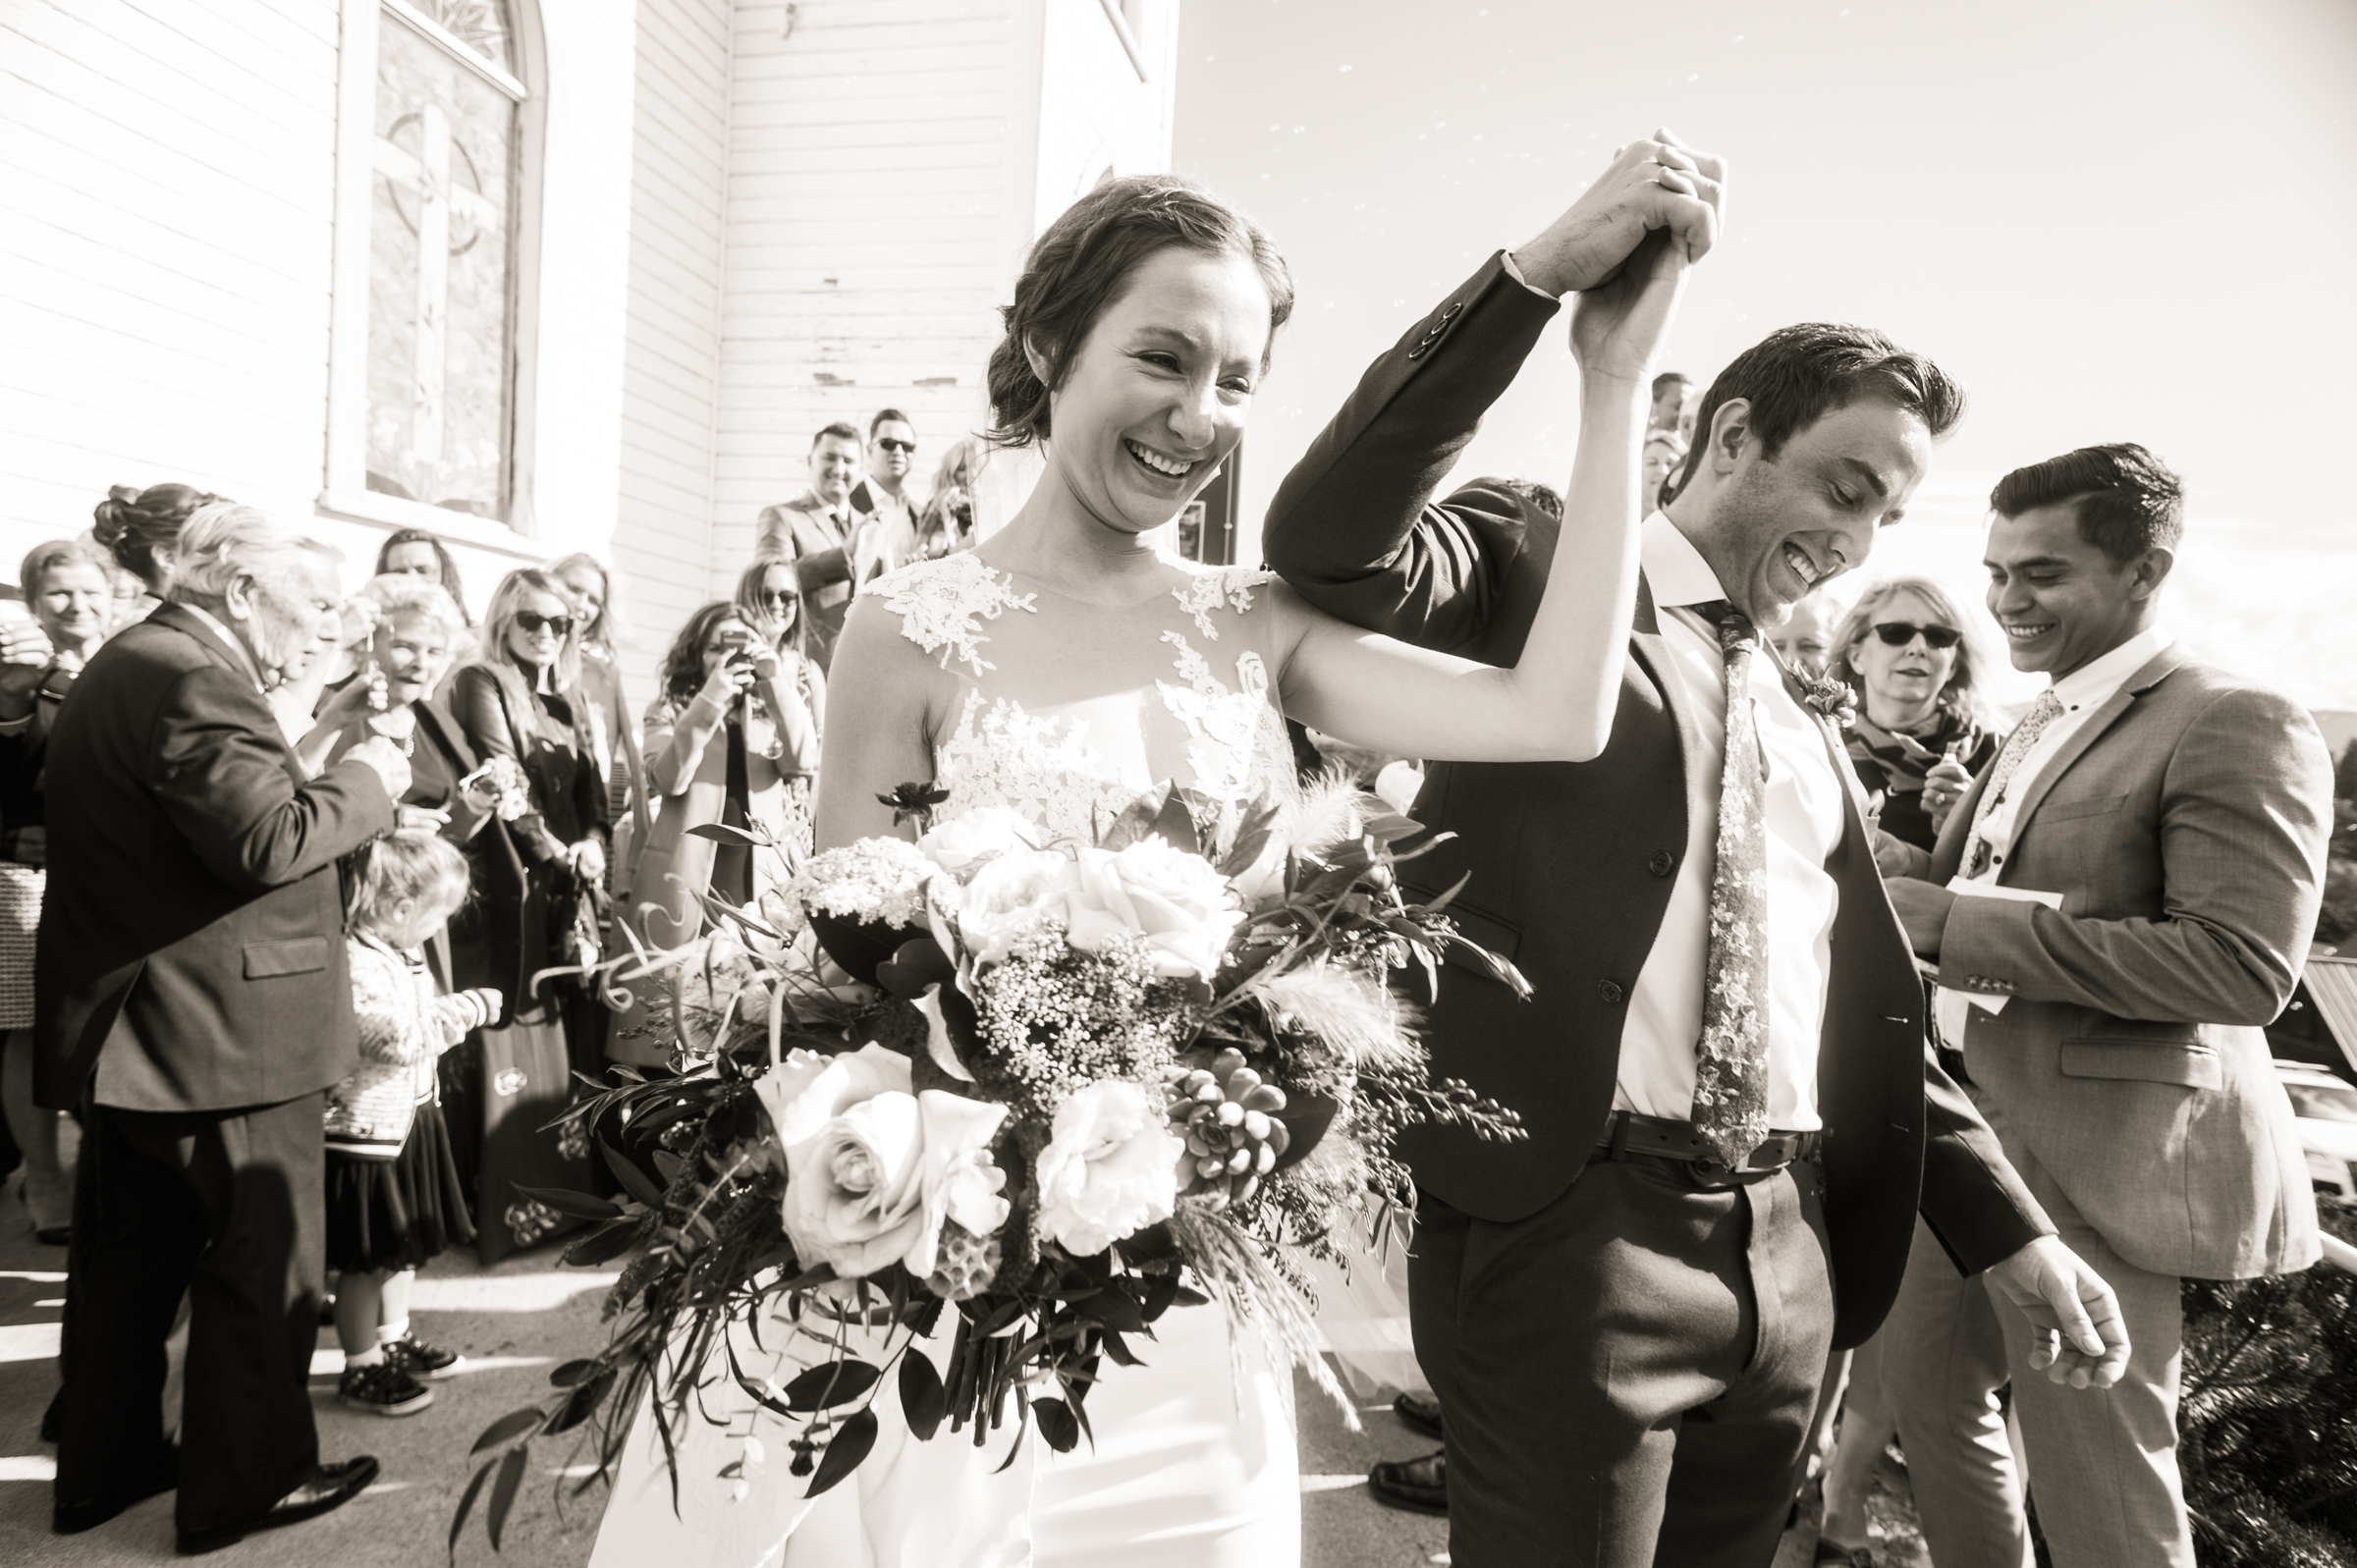 Happy couple celebrate after wedding ceremony - photo by Stephanie Cristalli Photography